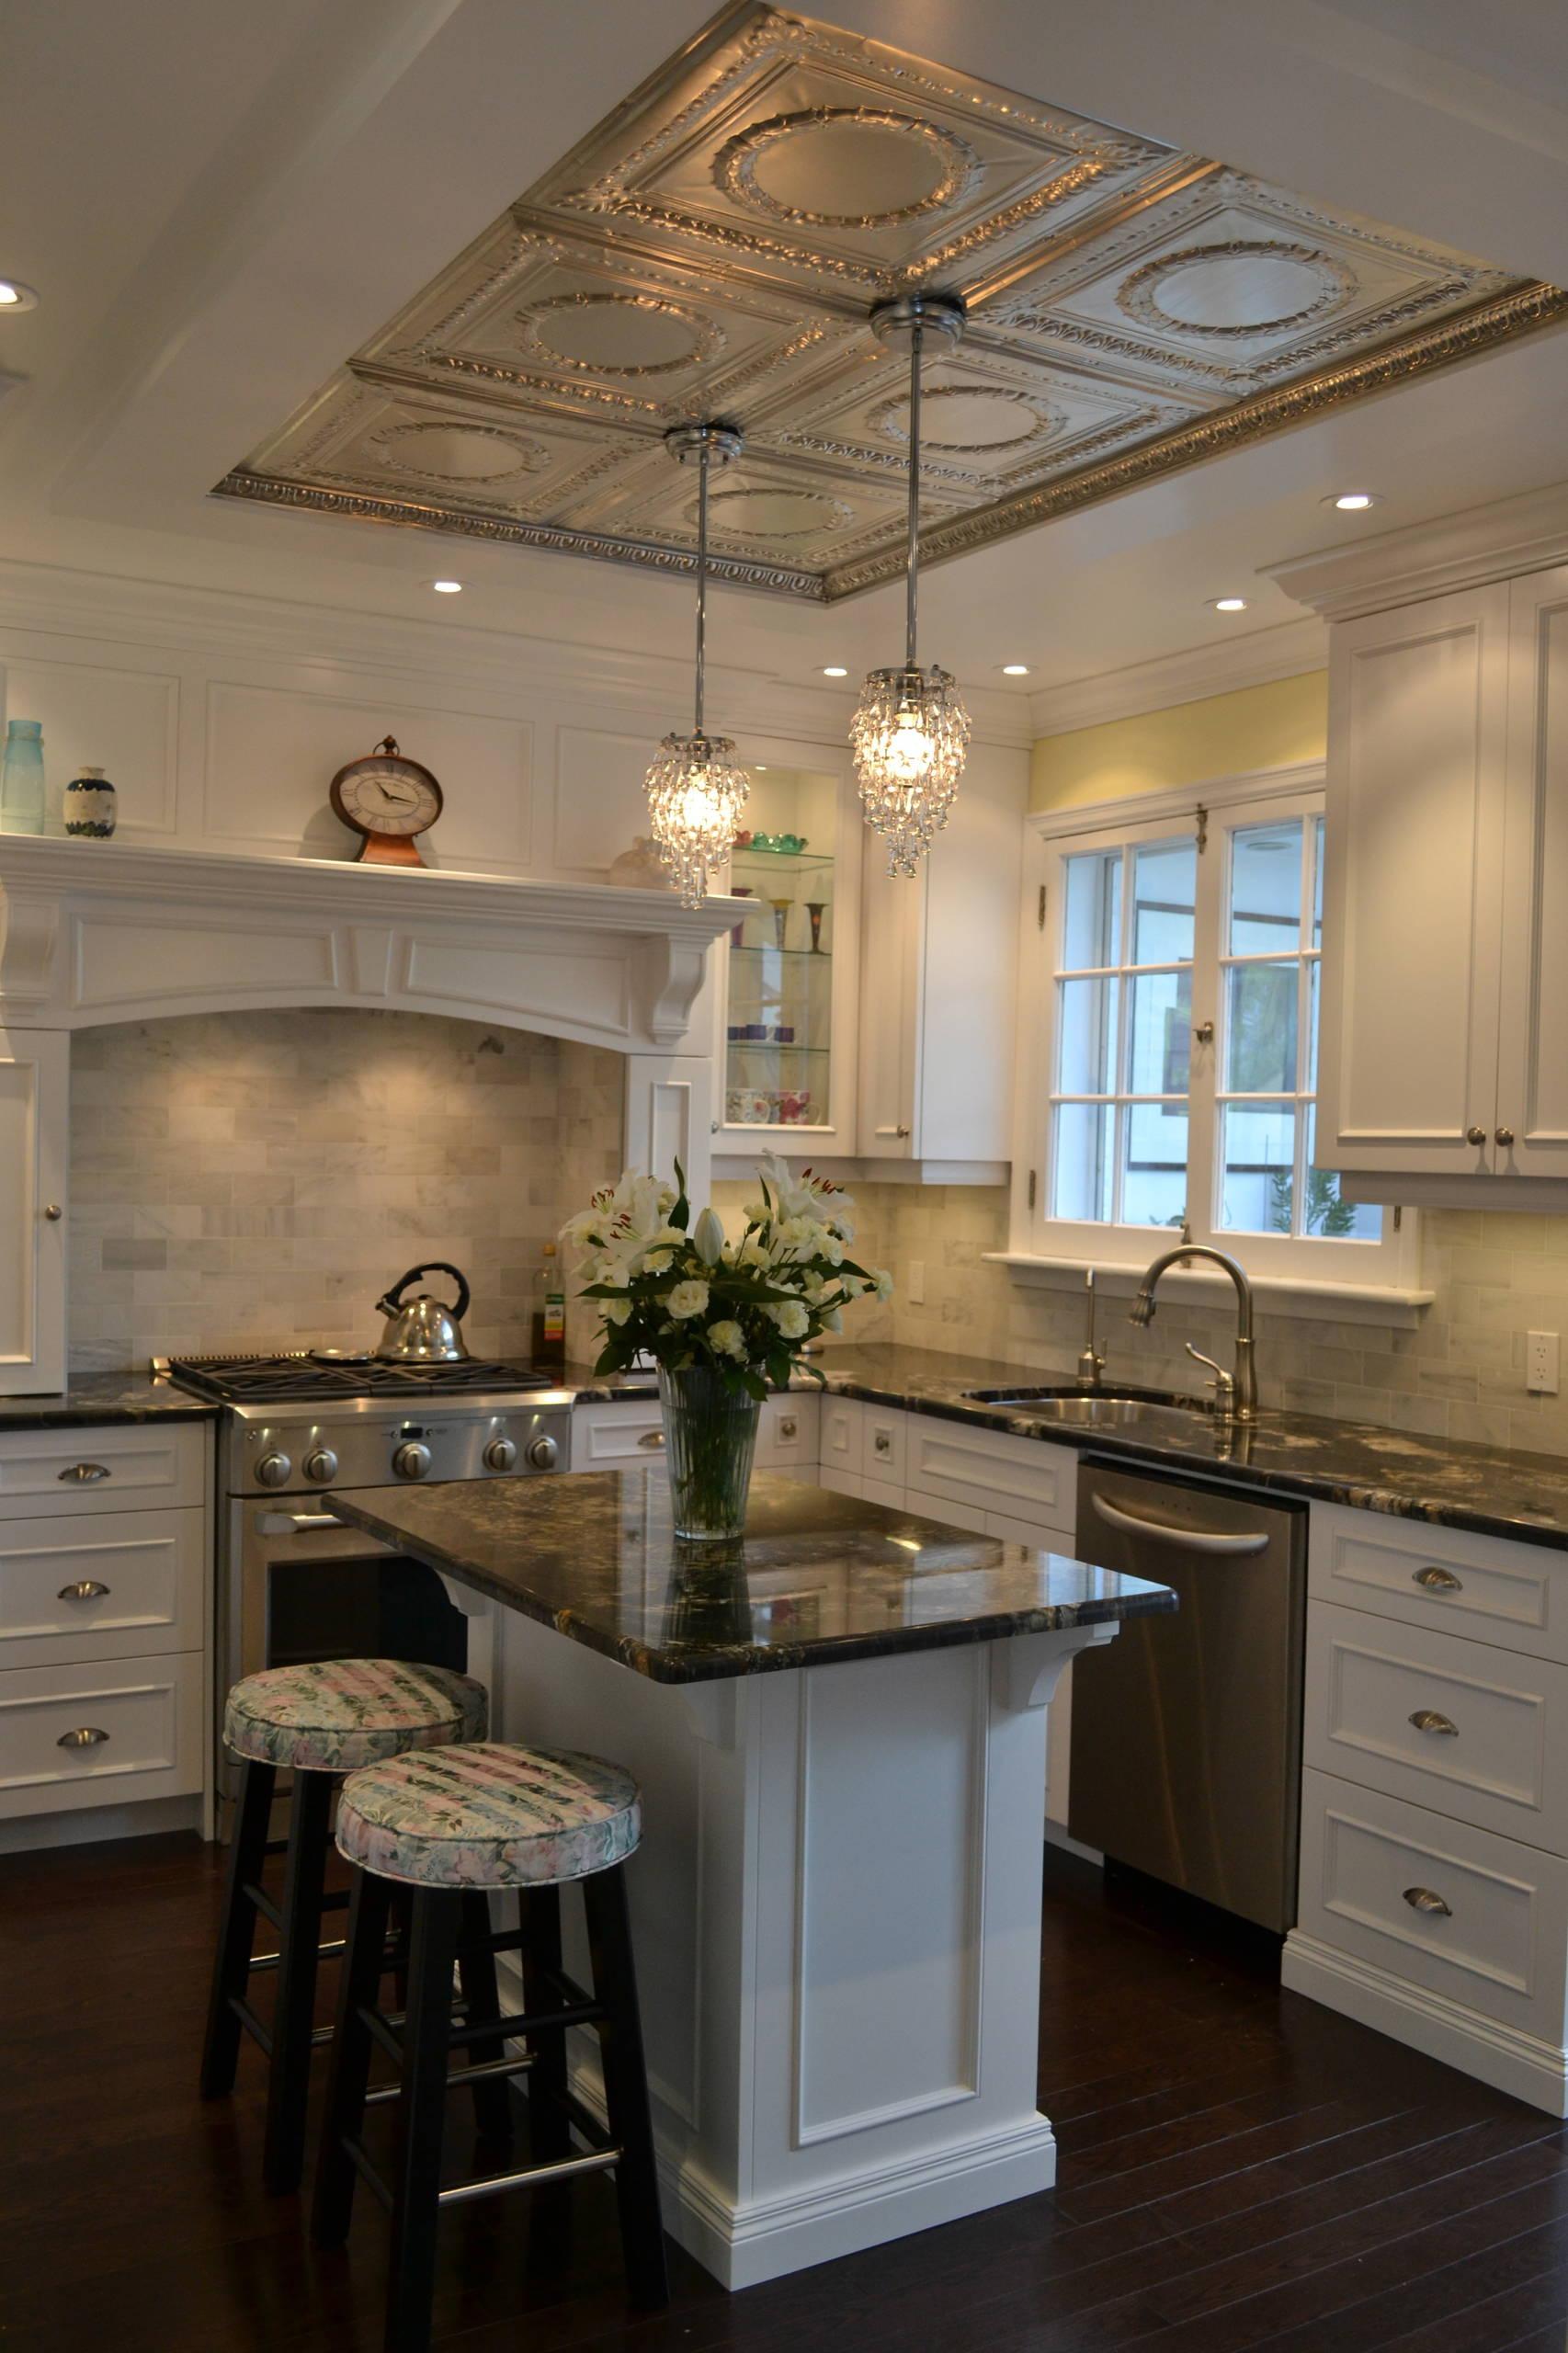 Tin Ceiling Tiles Backsplash Houzz